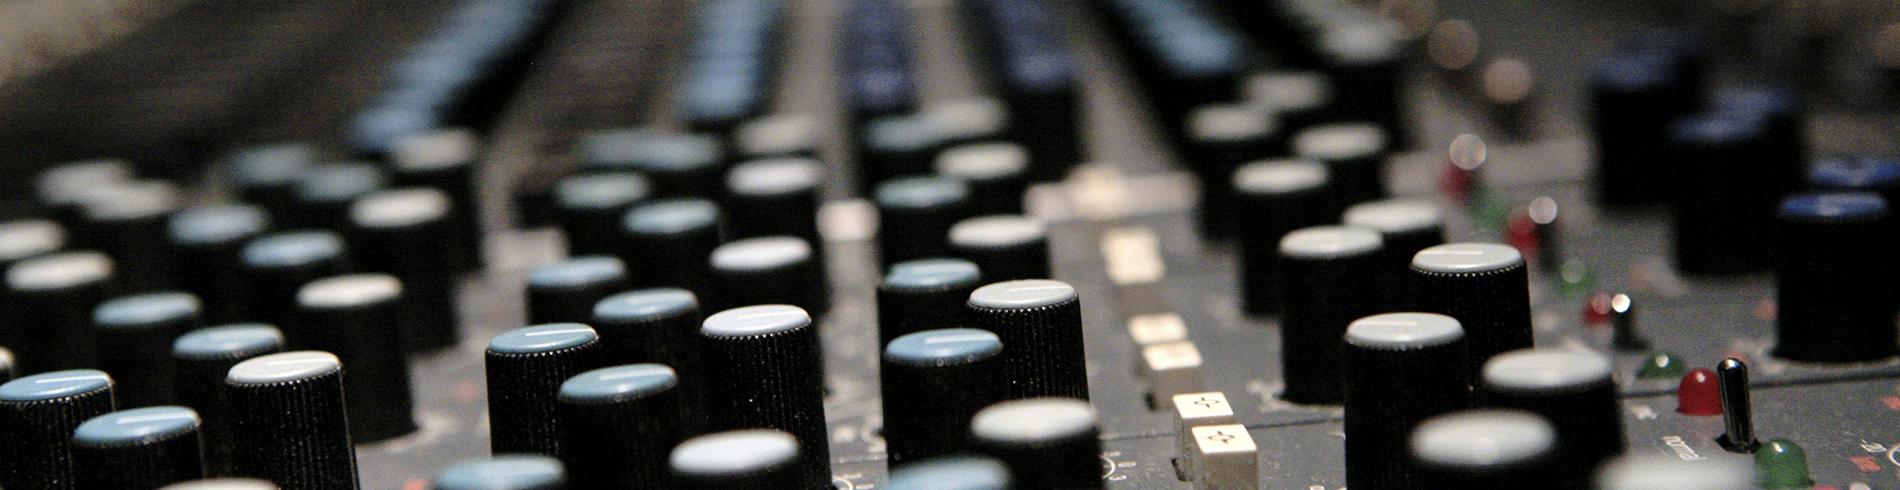 PYME-equipos-electronicos